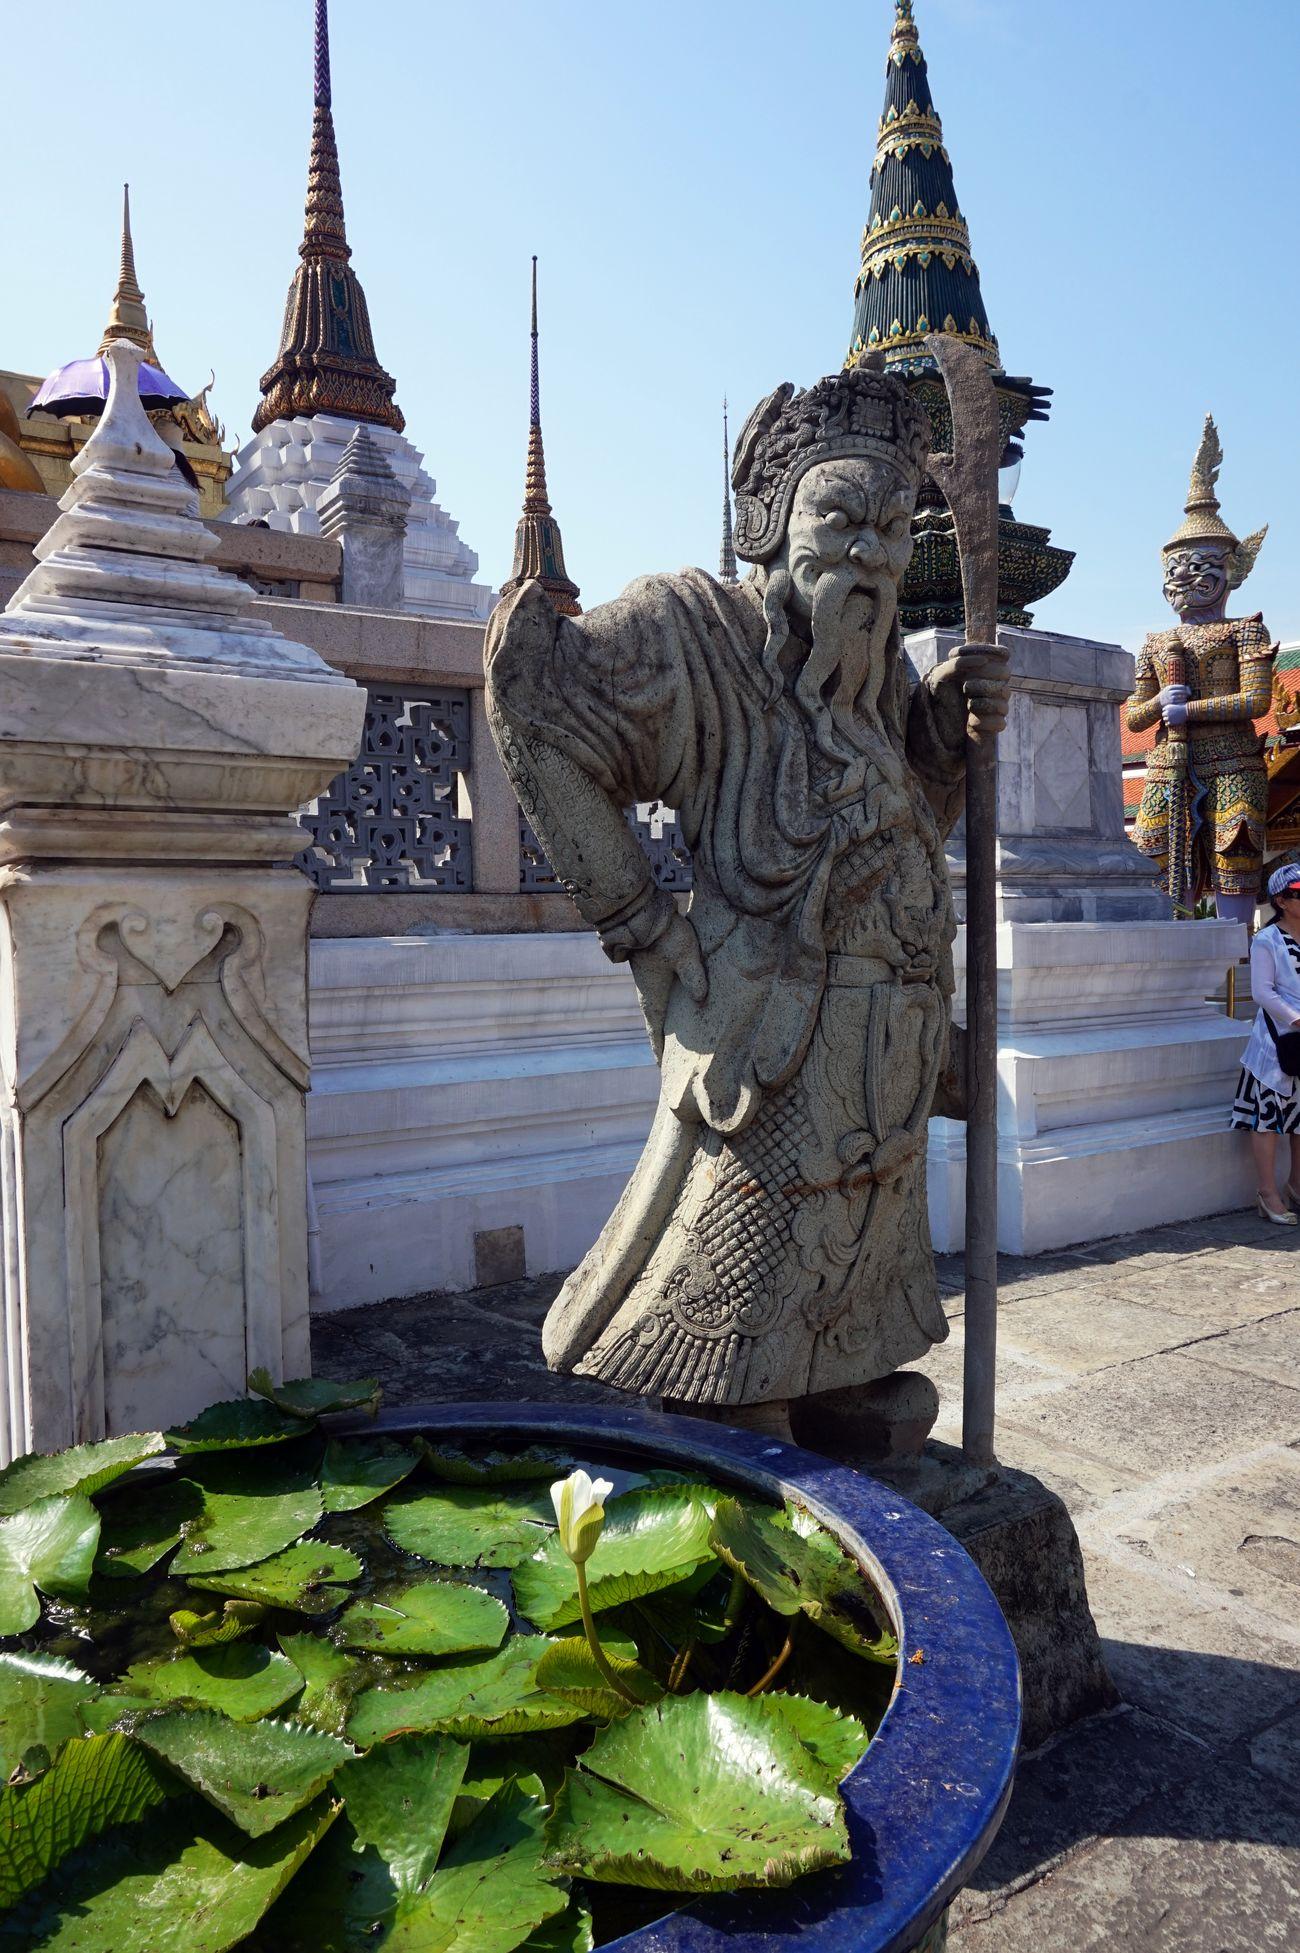 Grand Palace Bangkok Bangkok Thailand. Grand Palace Bangkok Thailand Place Of Worship Sculpture Spirituality Statue Thailand Thailand Photos Thailand_allshots Thailandtravel